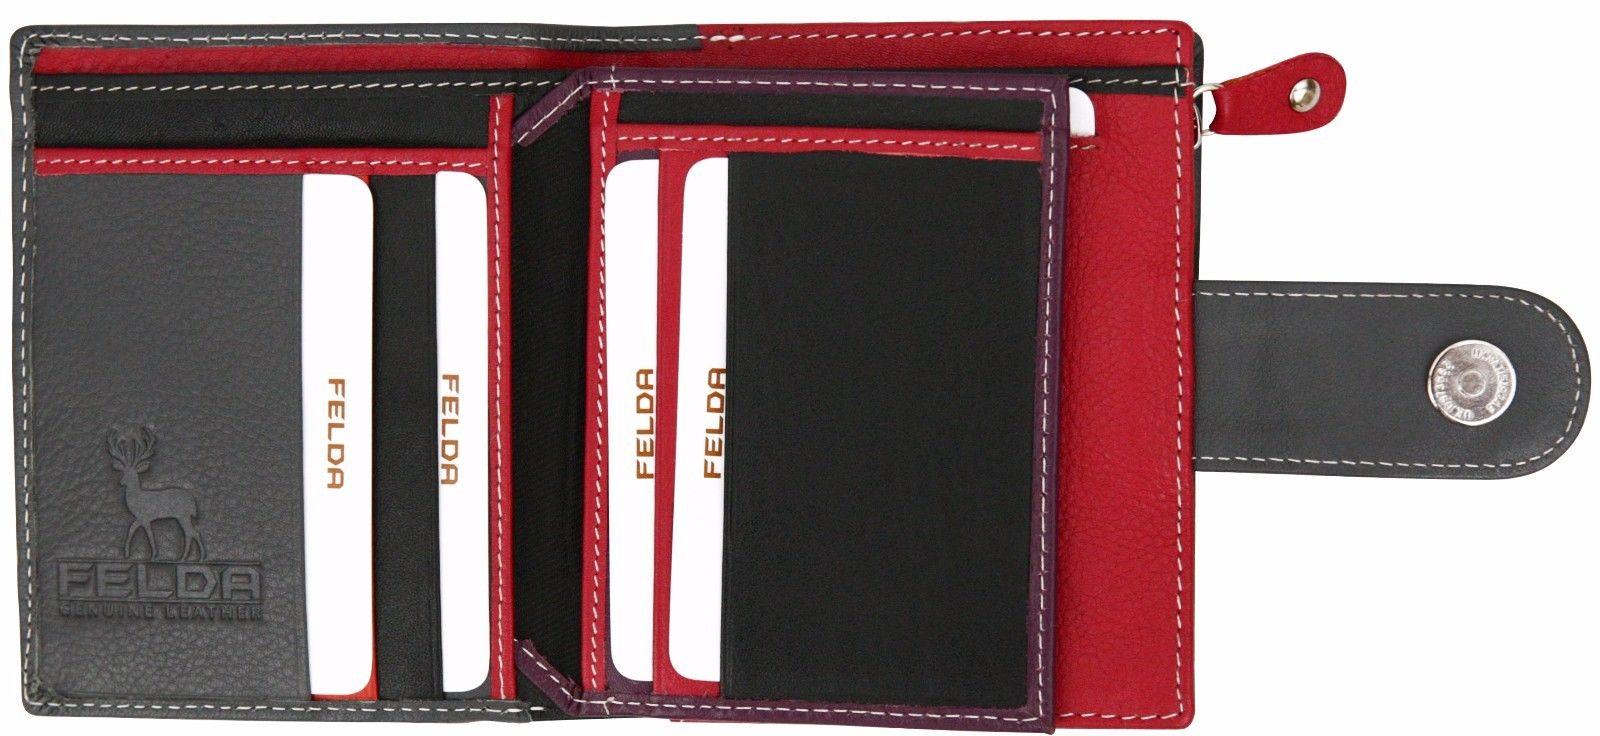 Felda-RFID-onorevoli-MEDAGLIA-amp-Card-Purse-Wallet-Genuine-Leather-Multi-SOFT-BOX-REGALO miniatura 39